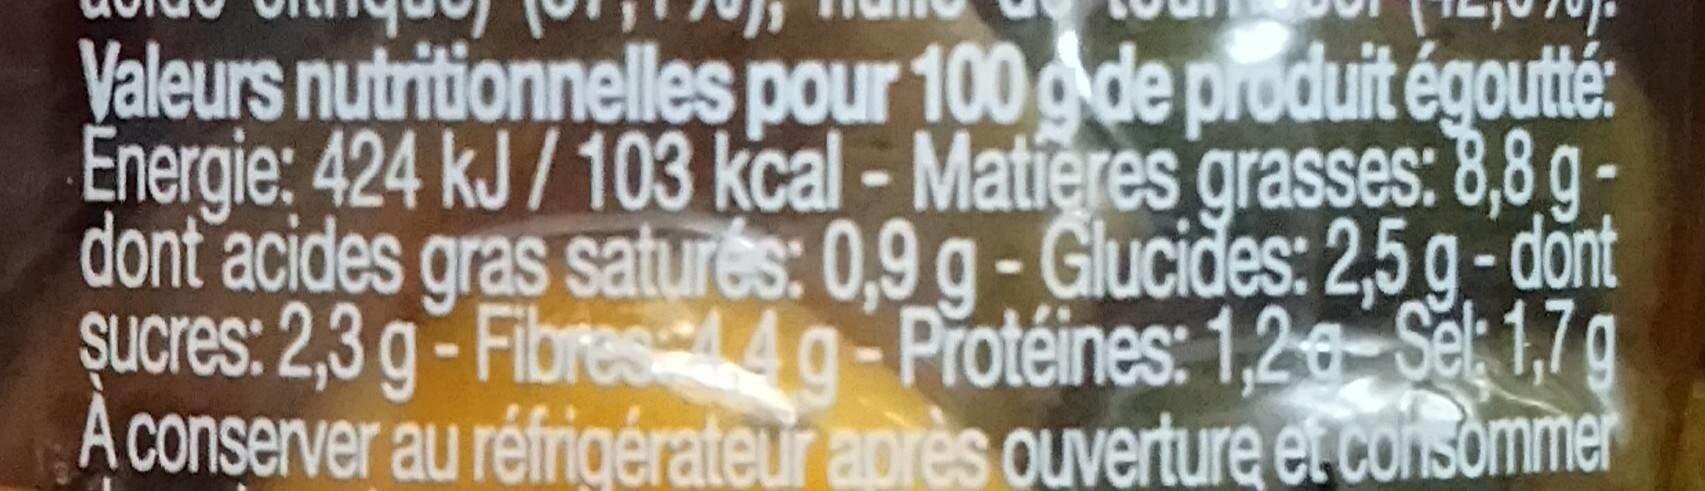 Melange de legumes grilles - Informations nutritionnelles - fr